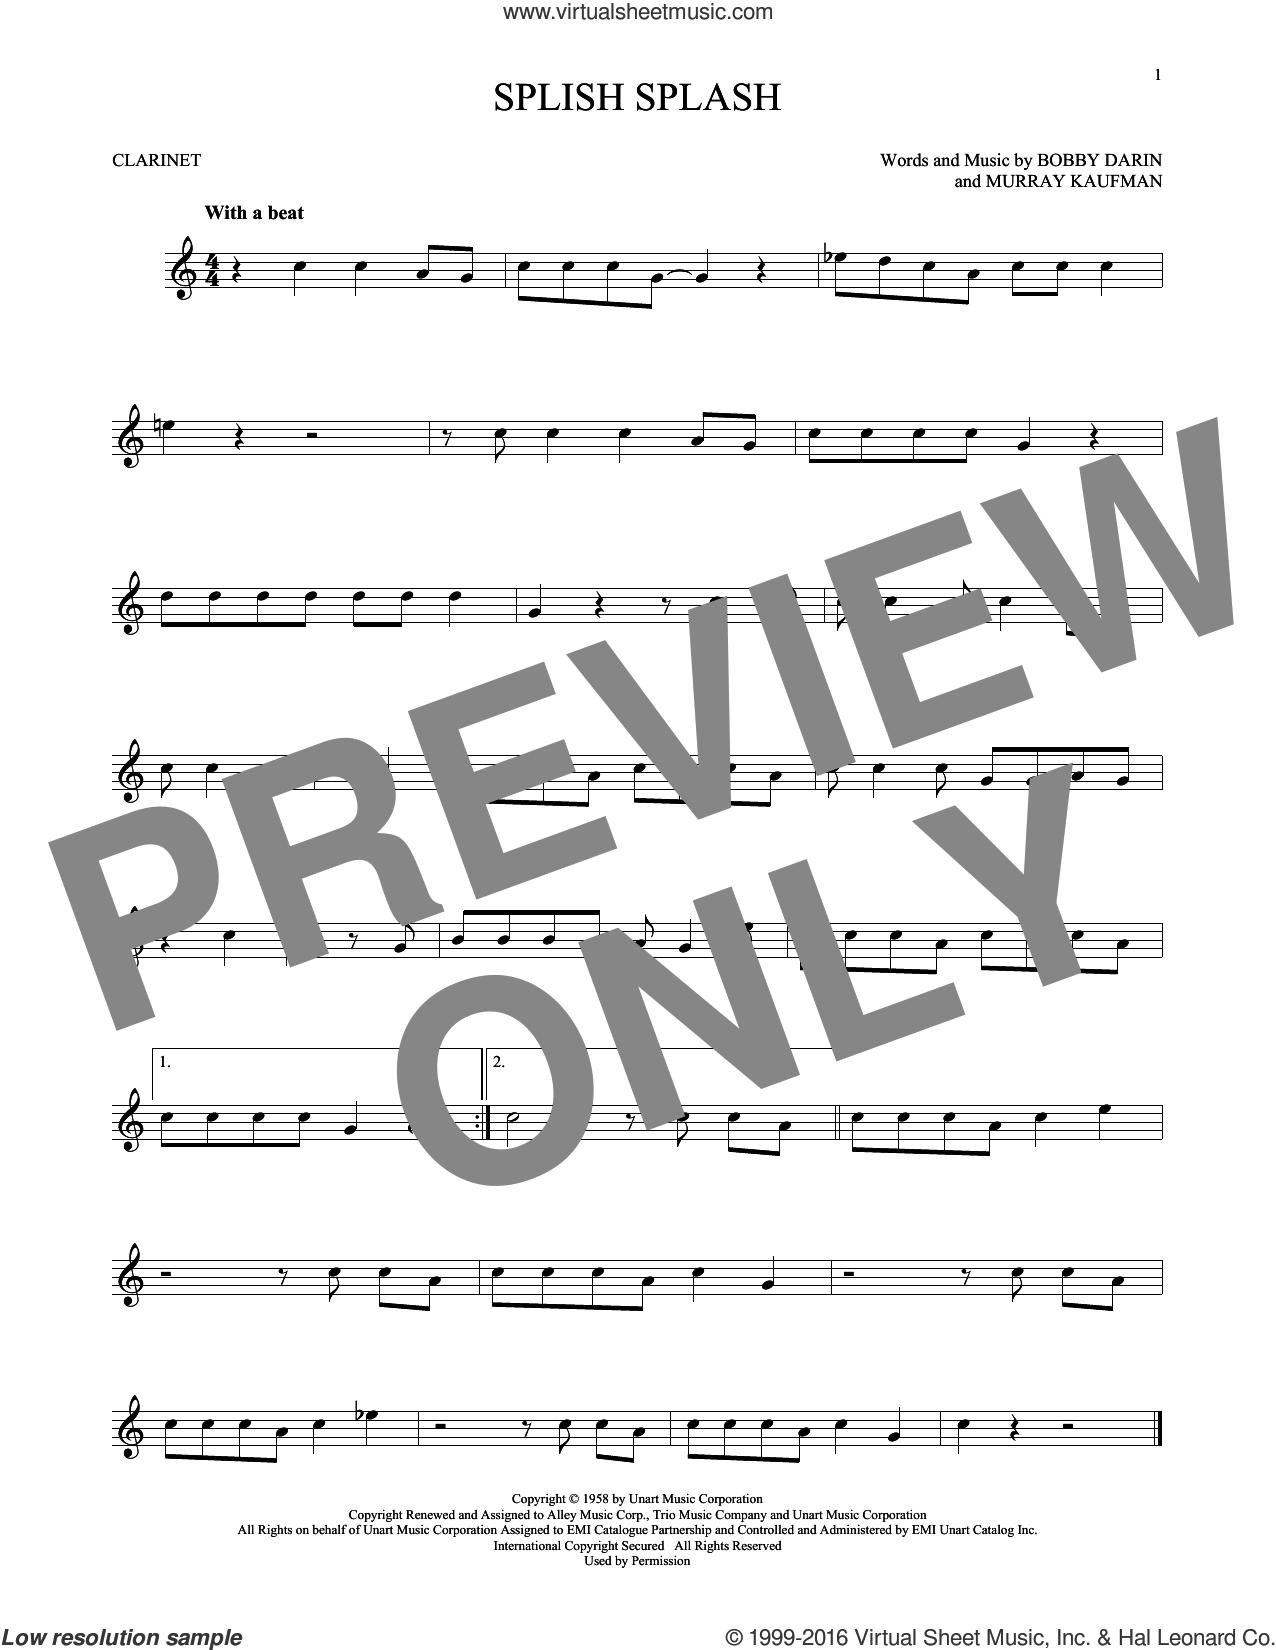 Splish Splash sheet music for clarinet solo by Bobby Darin and Murray Kaufman, intermediate skill level